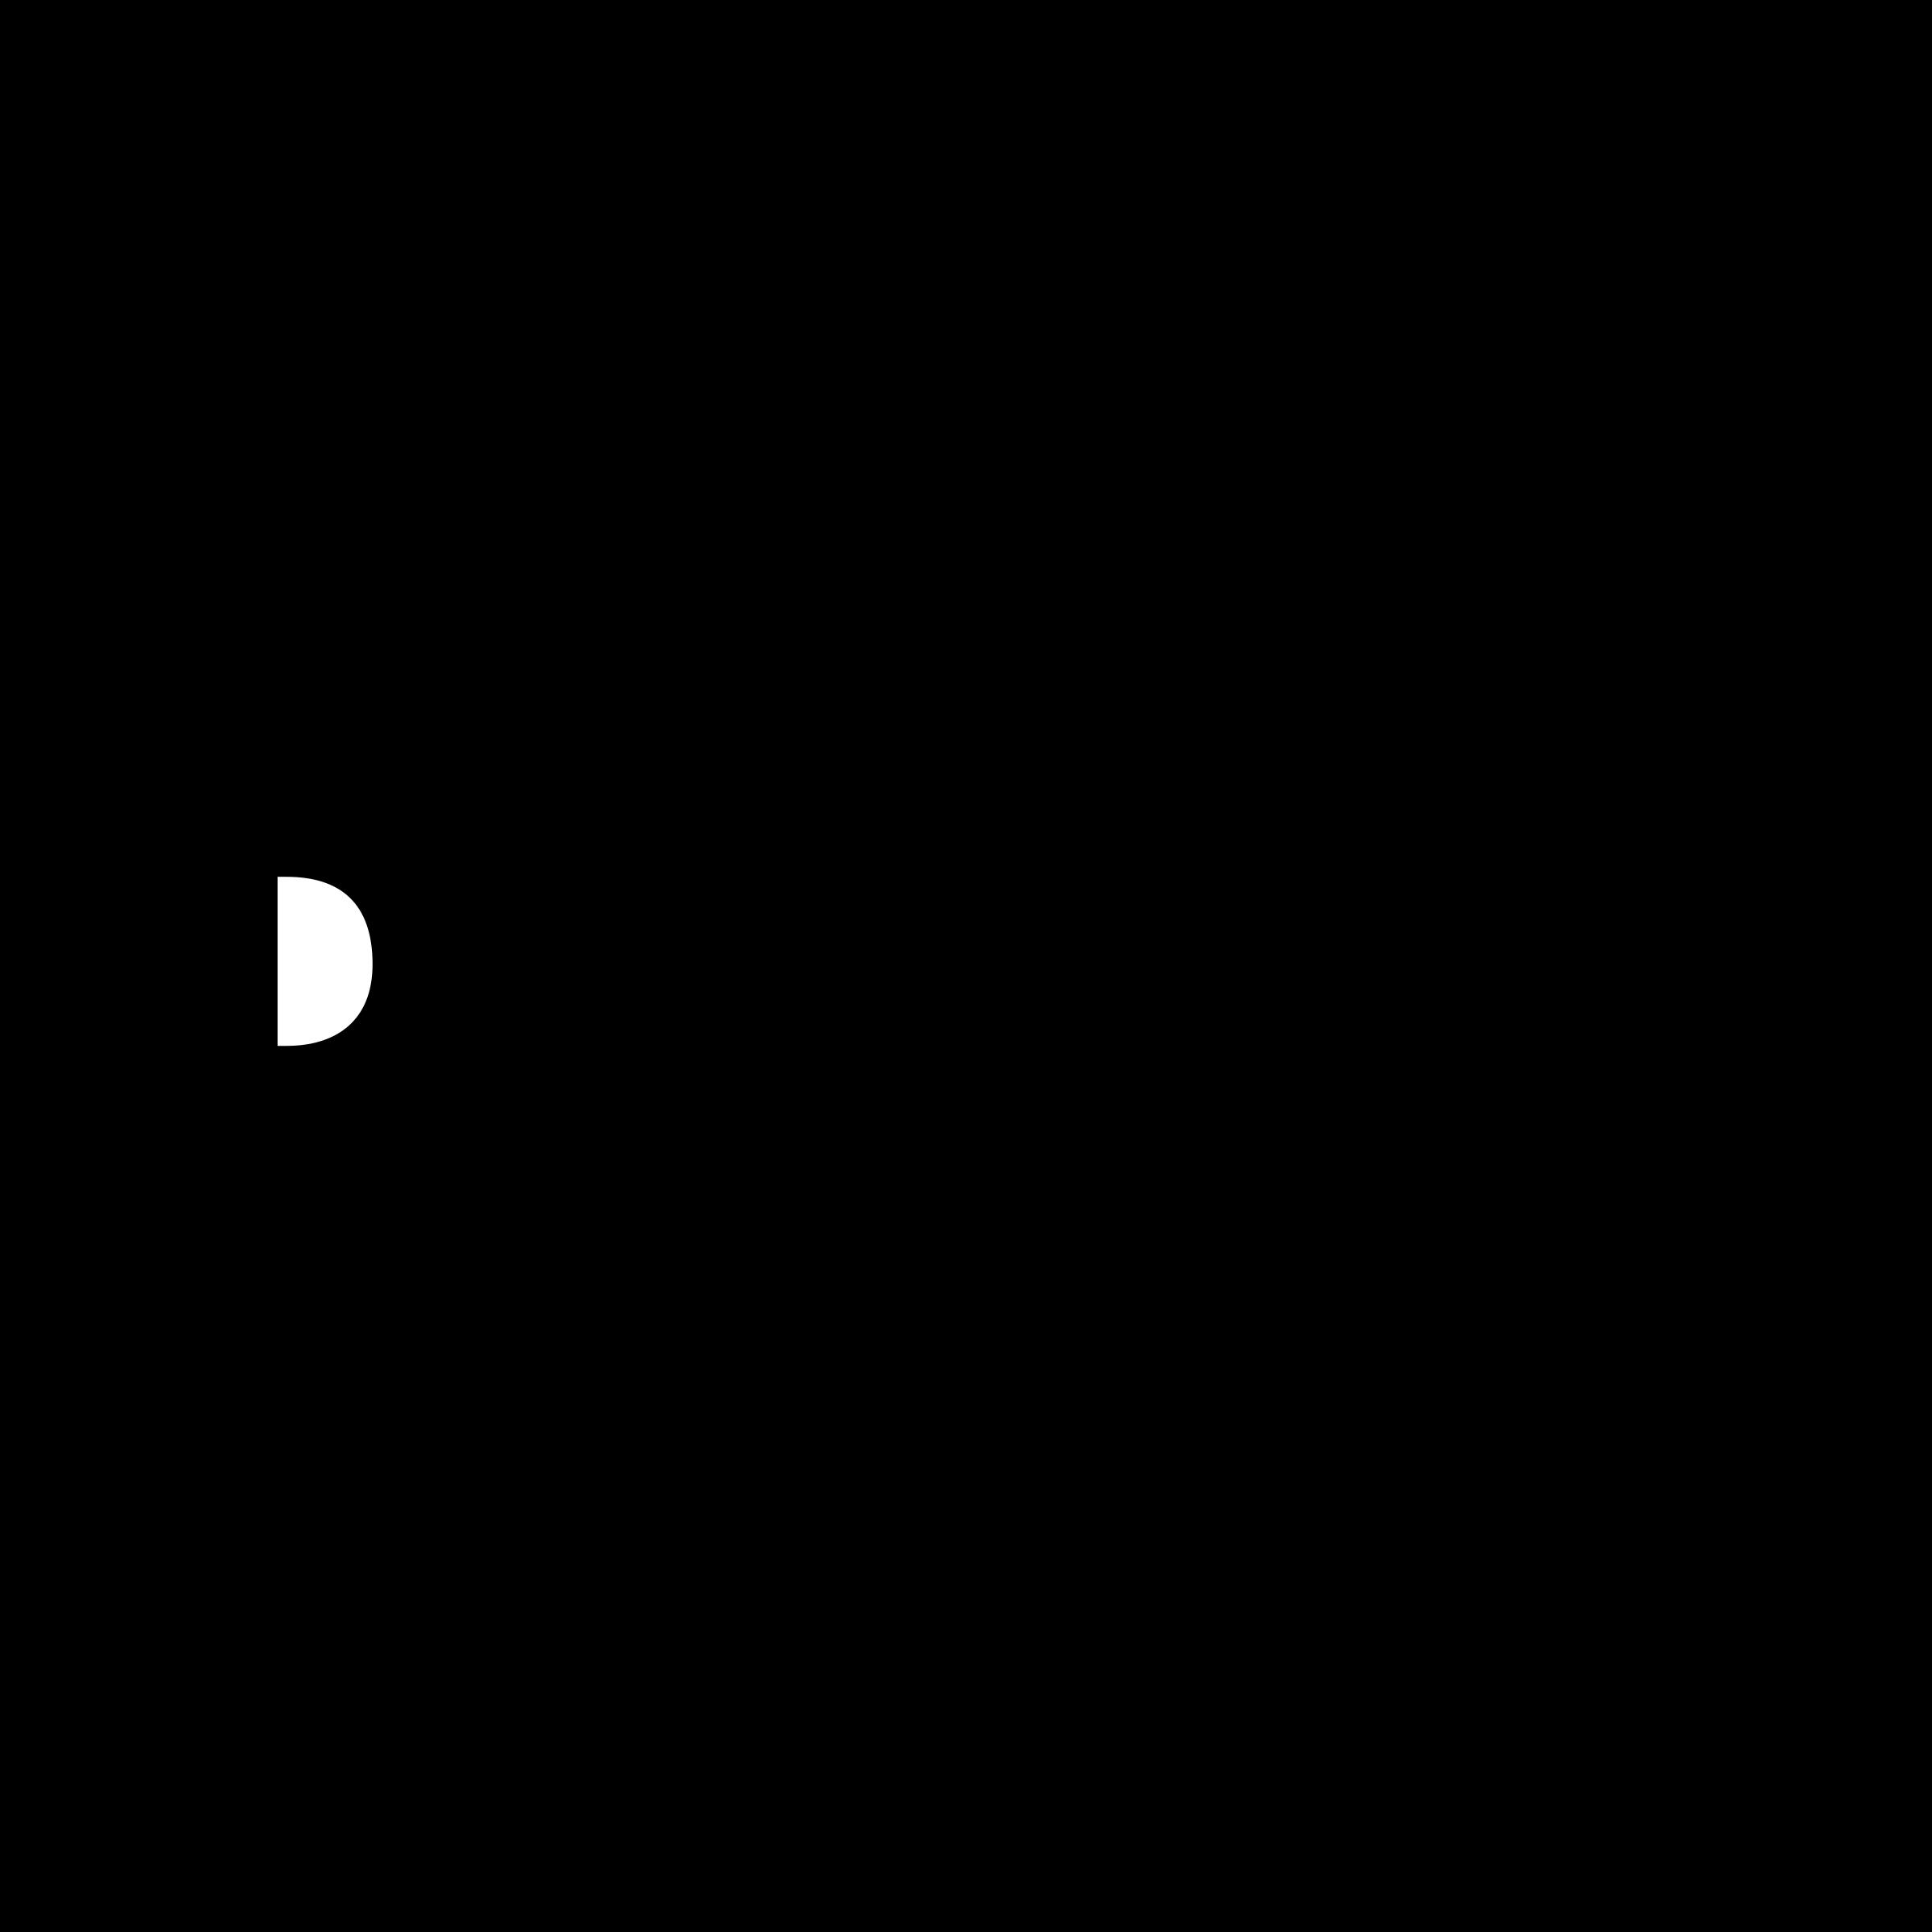 DKNY Logo PNG Transparent & SVG Vector.